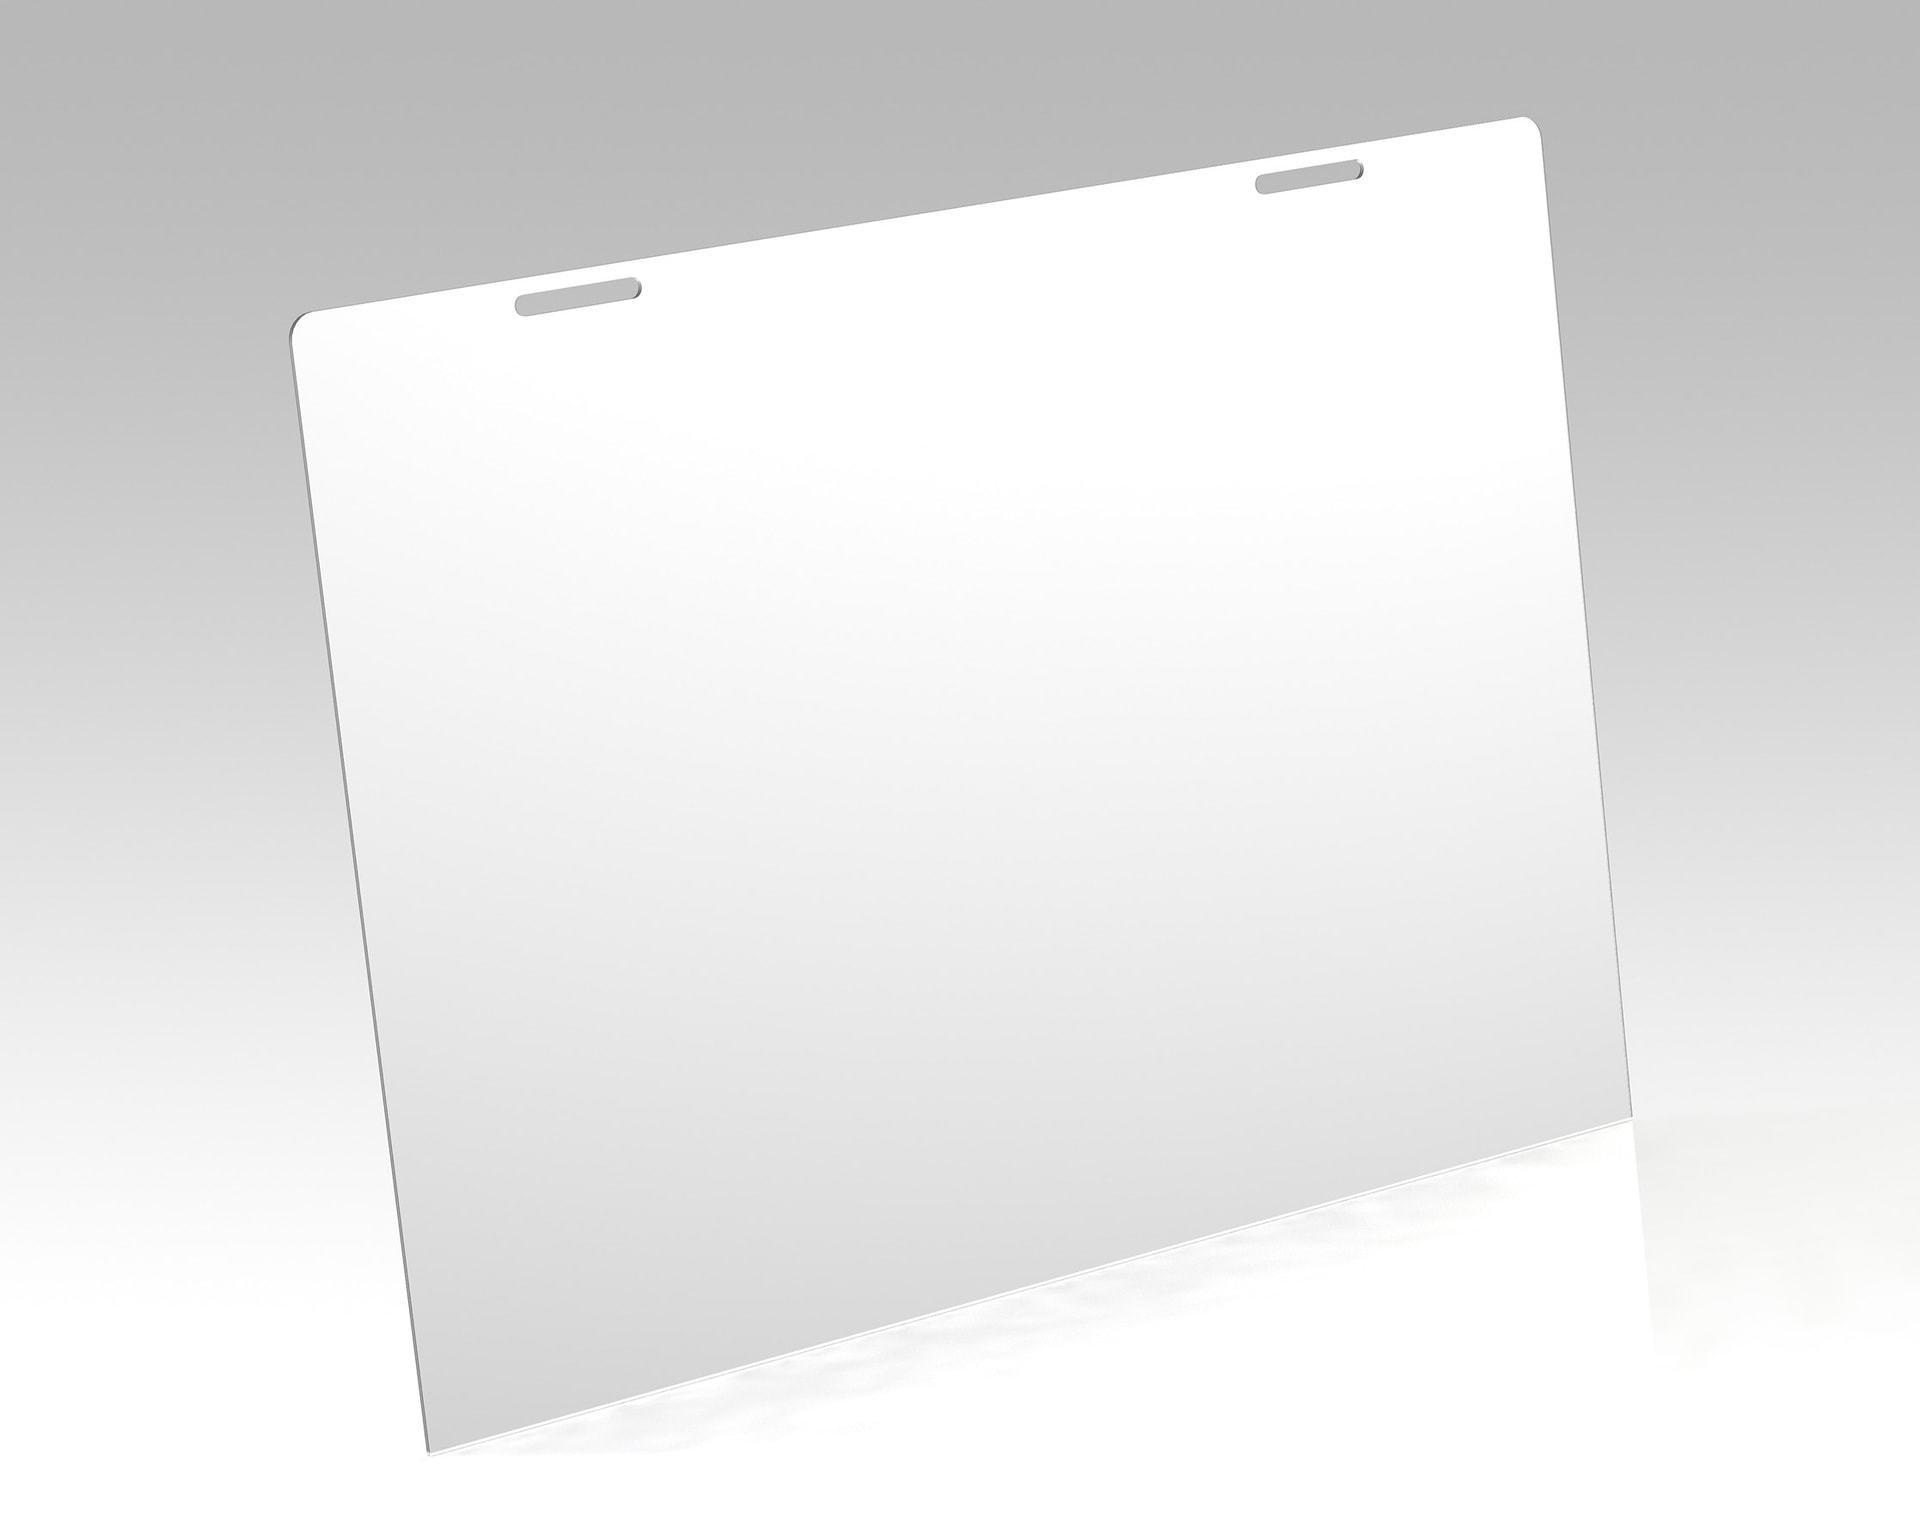 PEK3 Easytube Plastic Accessories LA C